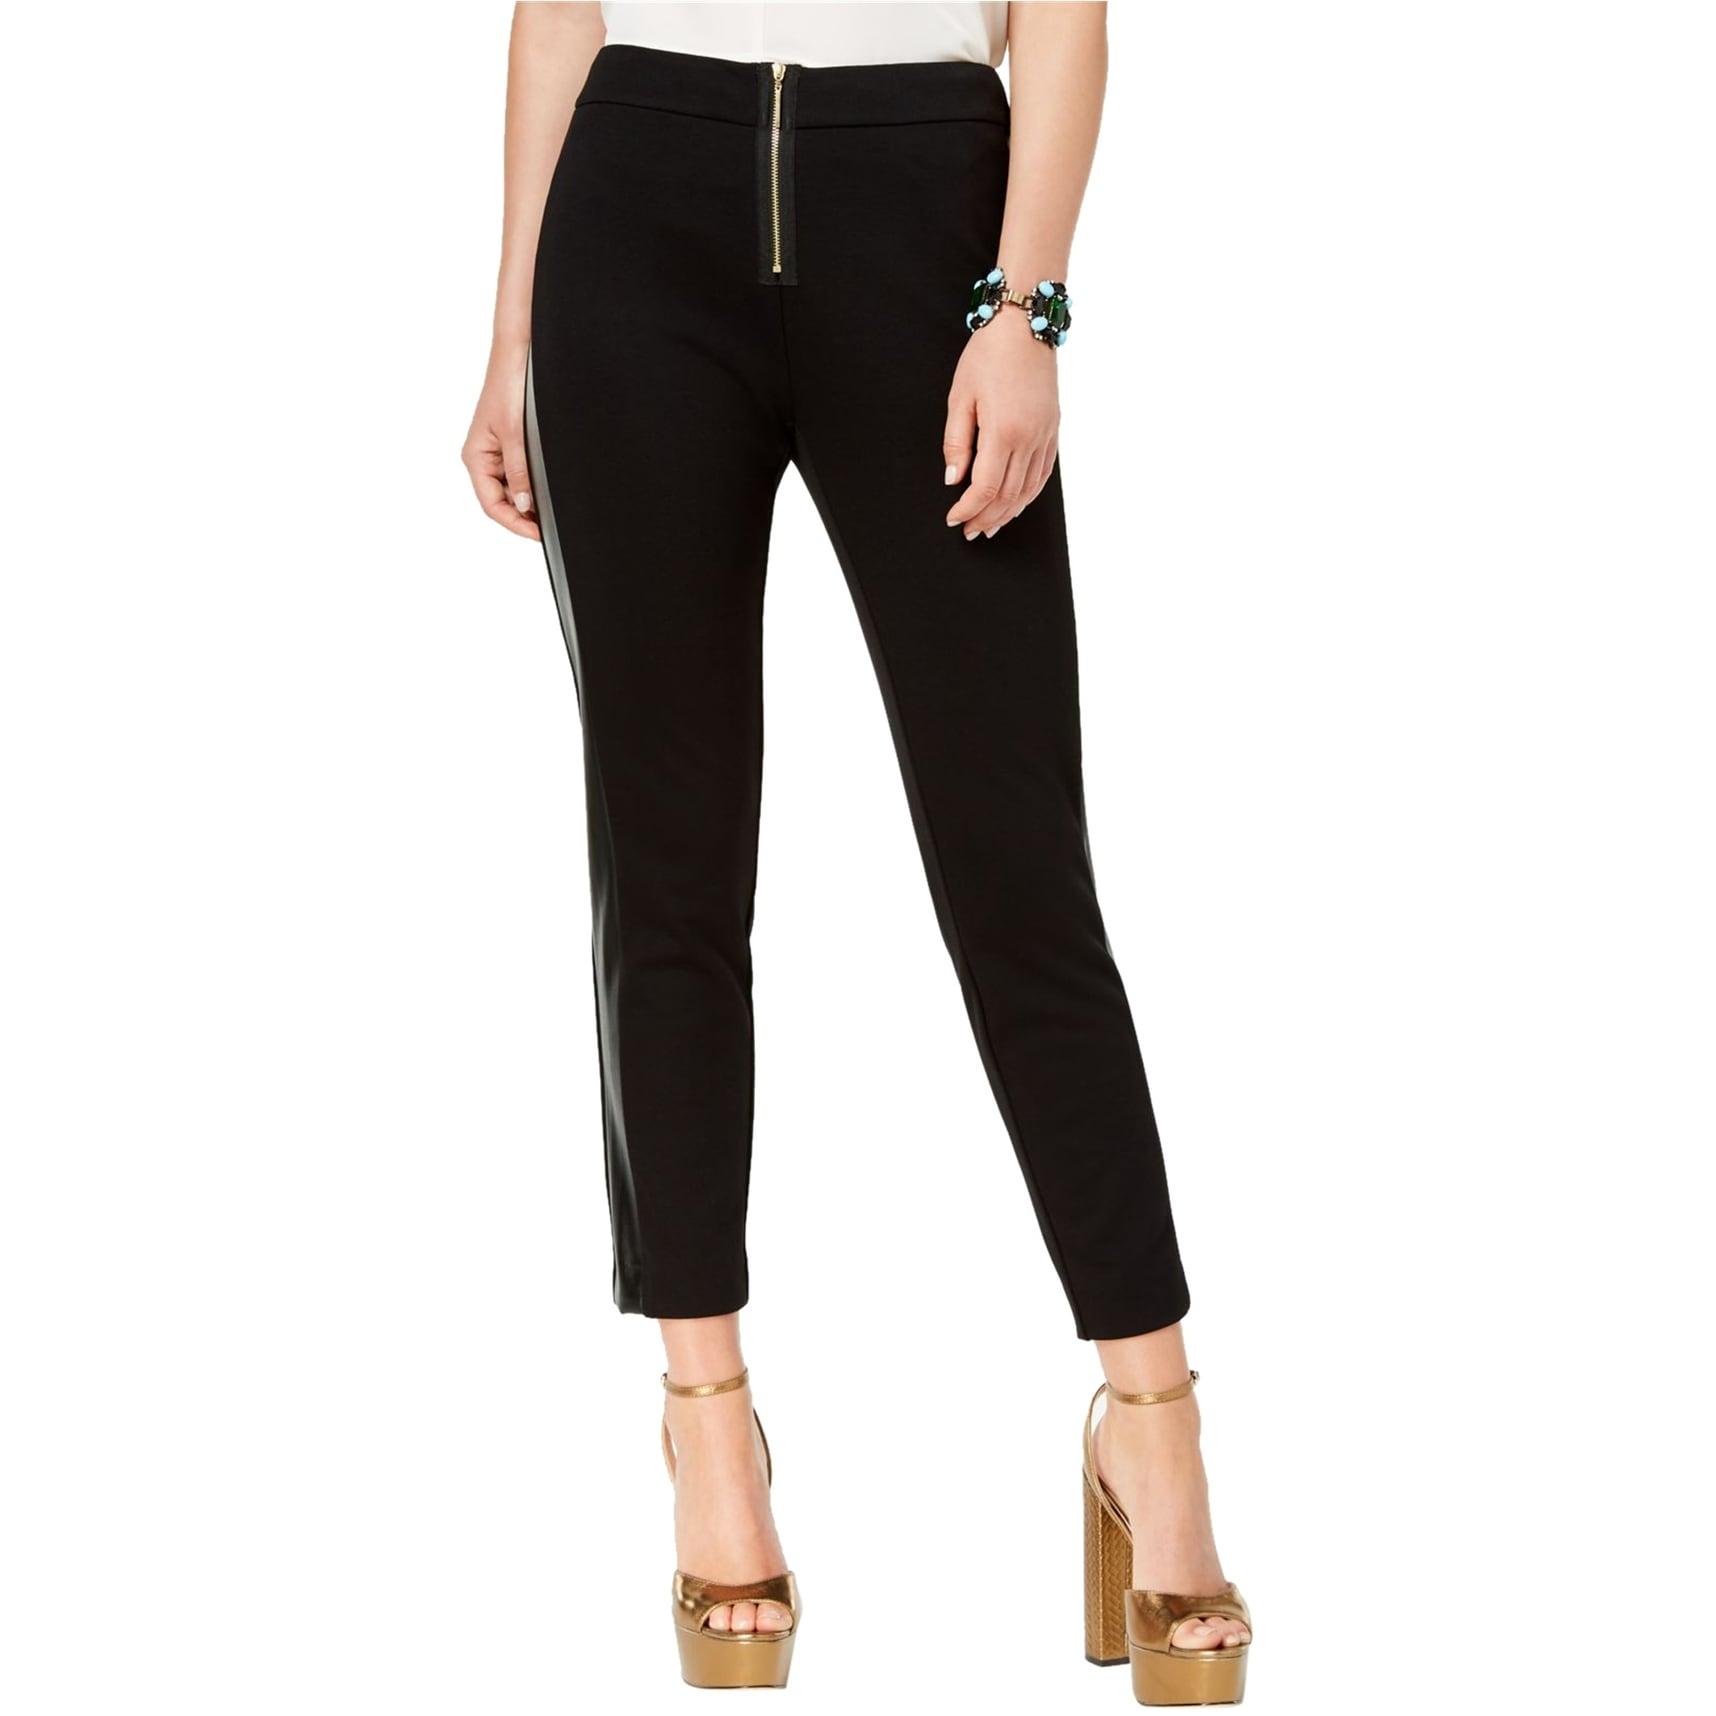 Shop Rachel Zoe Womens Pull On Dress Pants Leggings Overstock 29429646